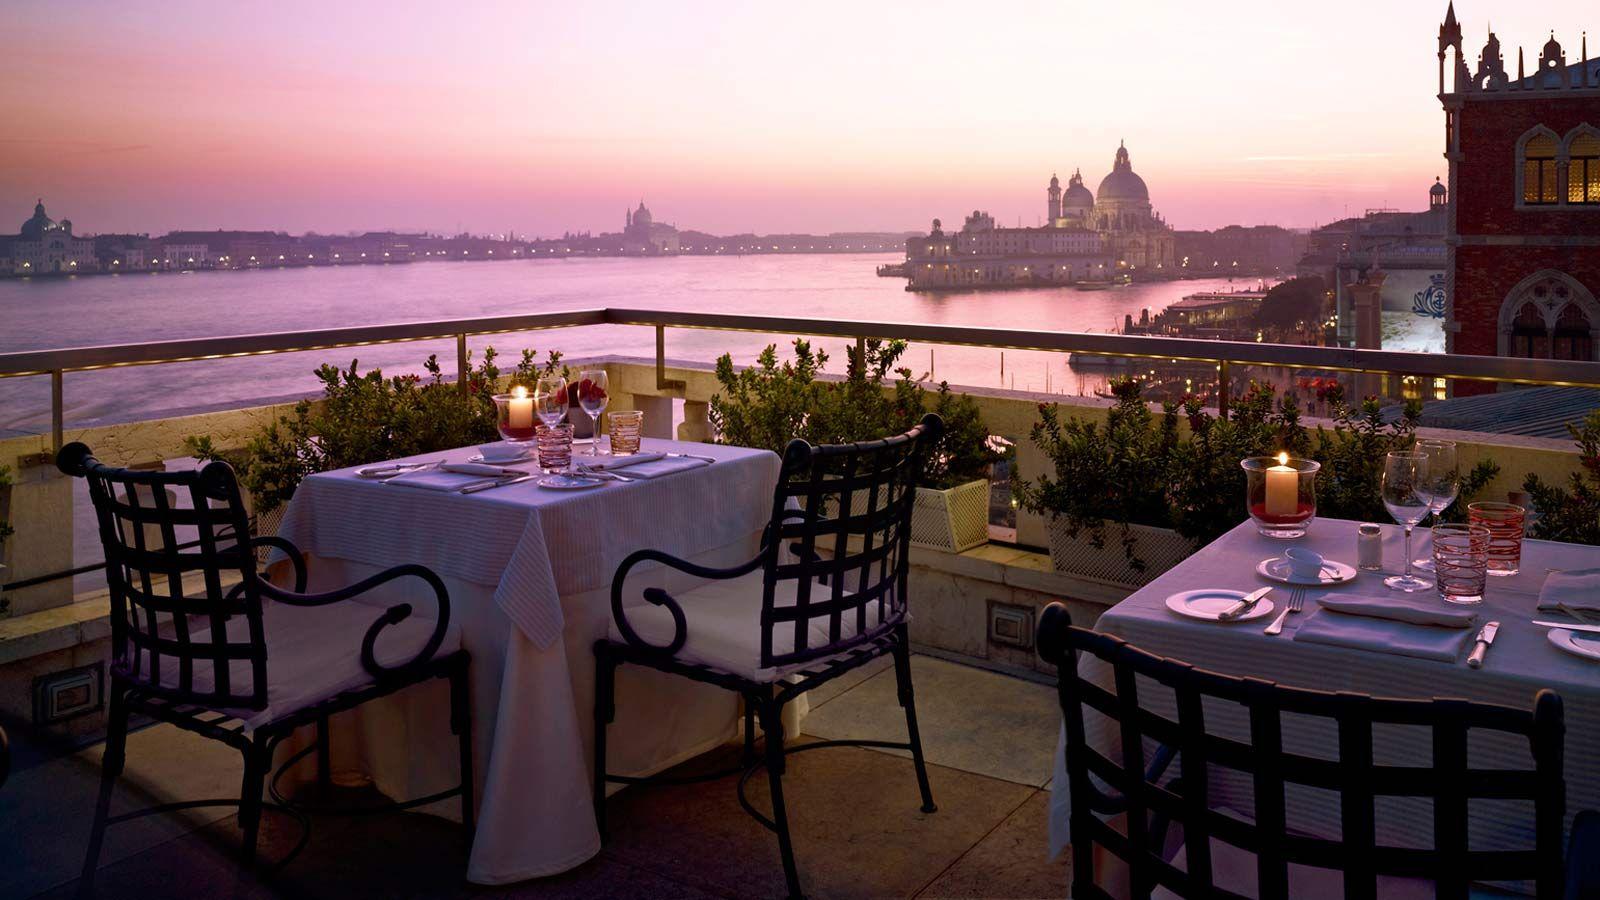 Danieli hotel venezia nel Venezia, Veneto | HOTELS | Pinterest ...